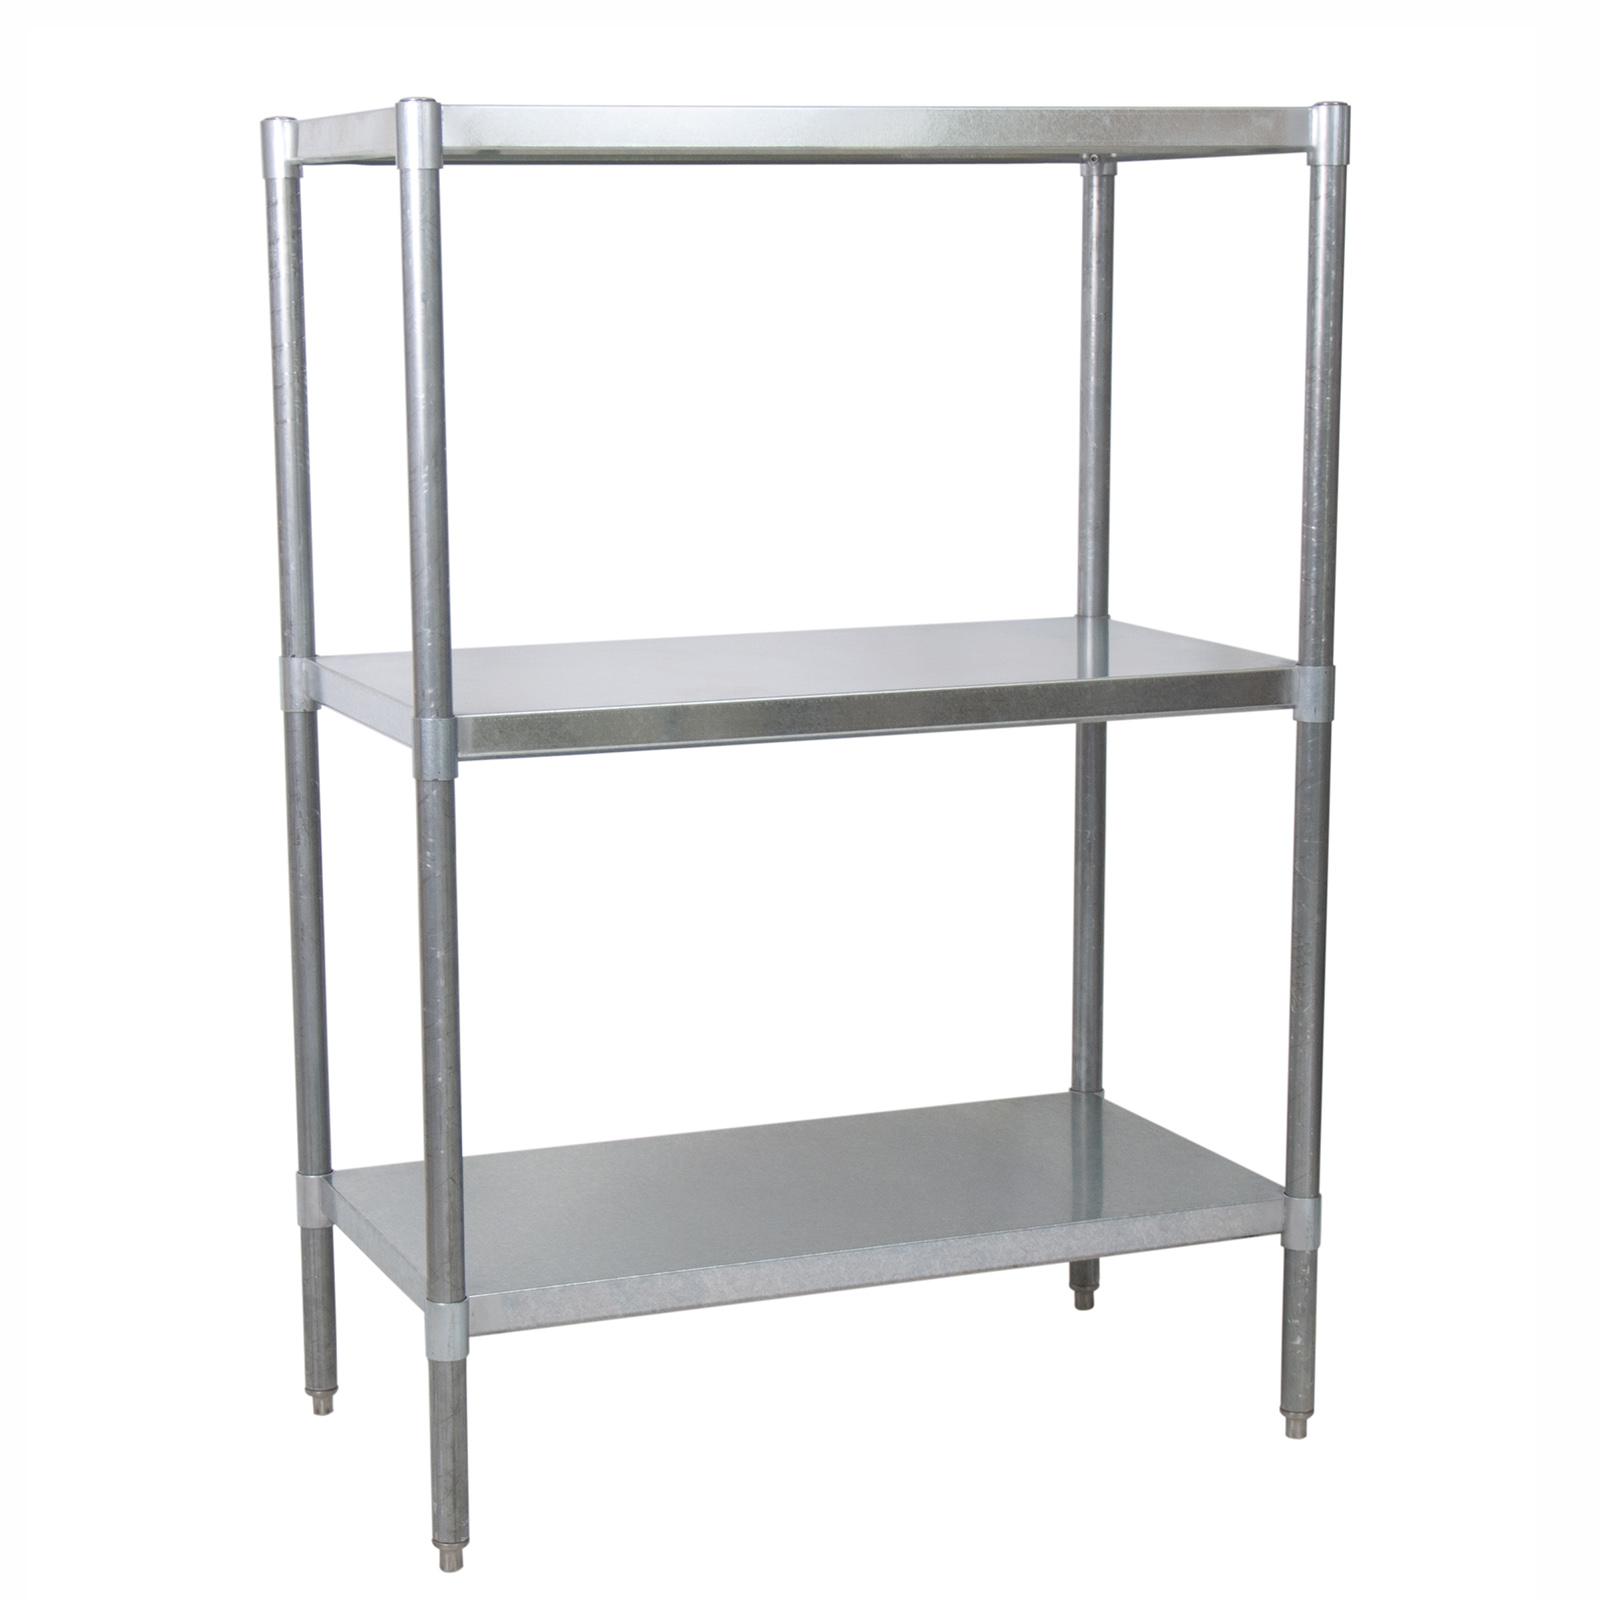 BK Resources VSU5-6724 shelving unit, solid flat